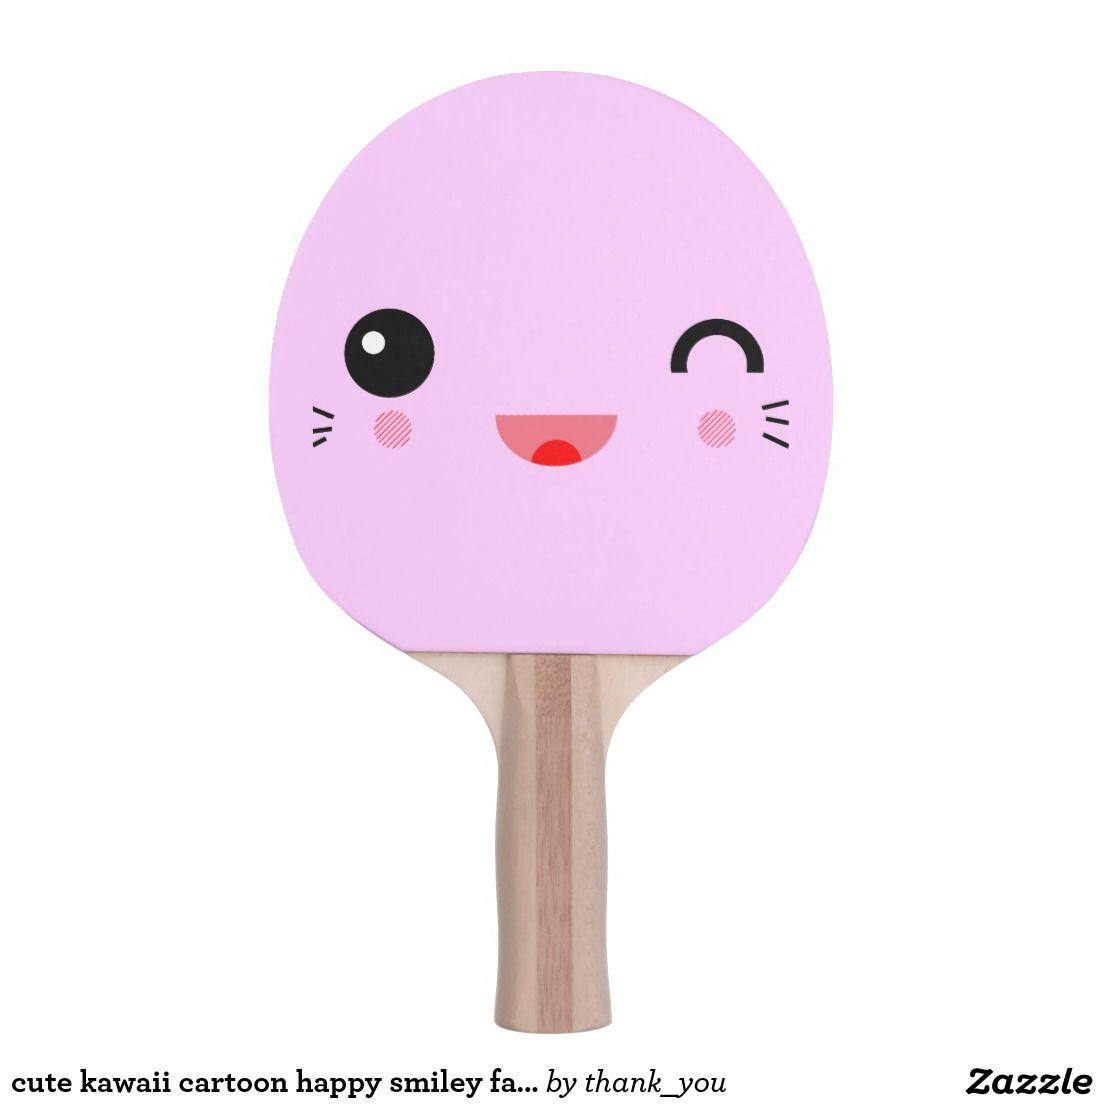 Cute Cartoon Happy Face Ping Pong Paddle Zazzle Com Happy Smiley Face Ping Pong Paddles Gadget Gifts